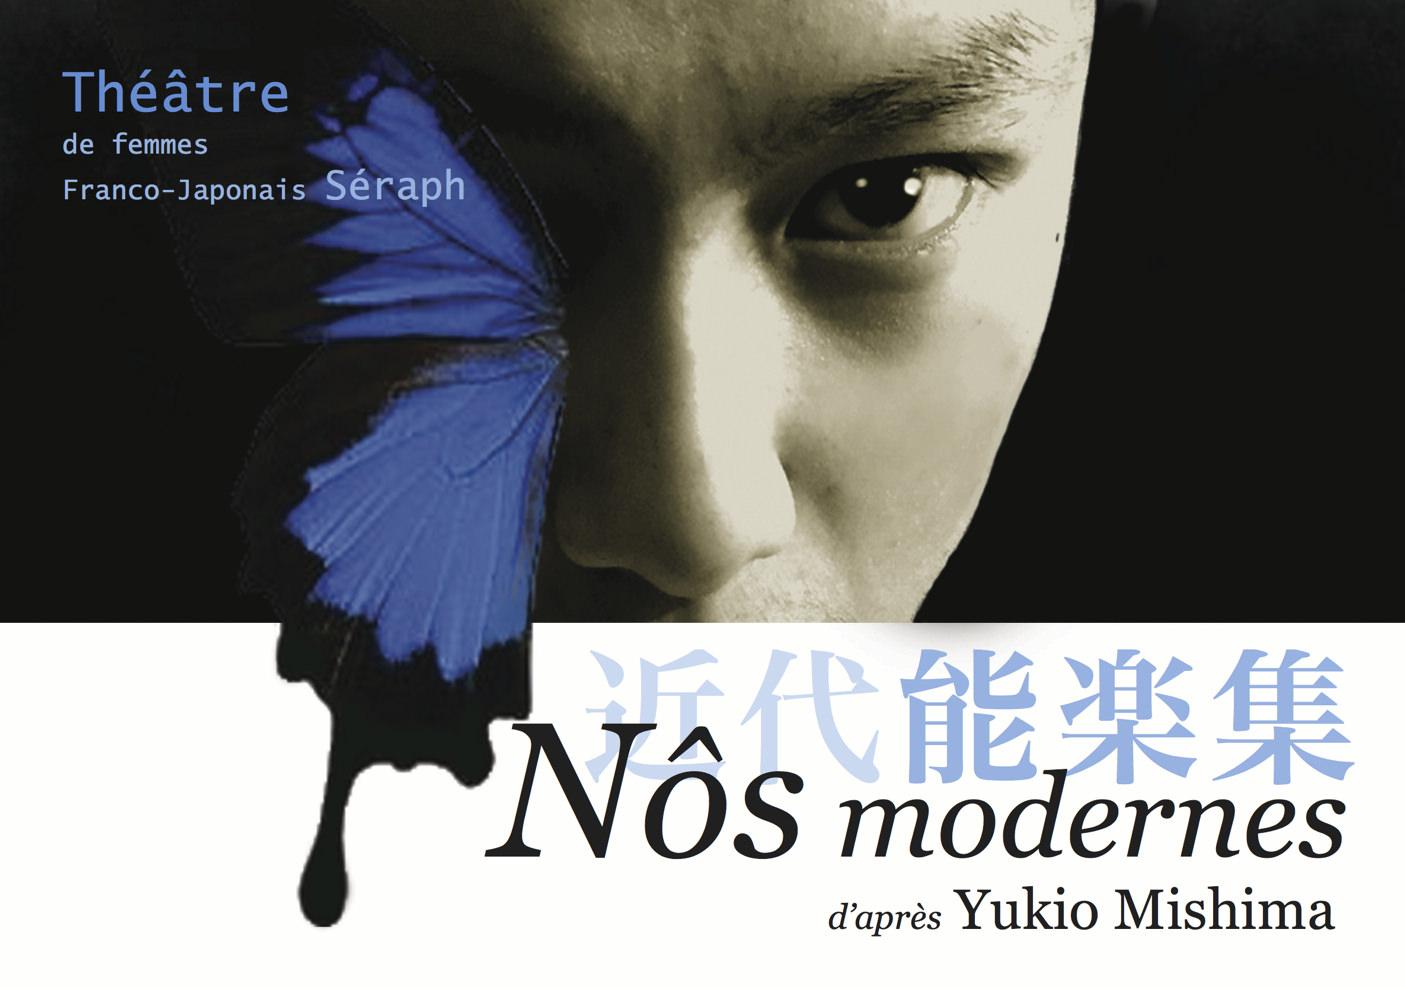 """Nôs modernes"" d'après Yukio Mishima"